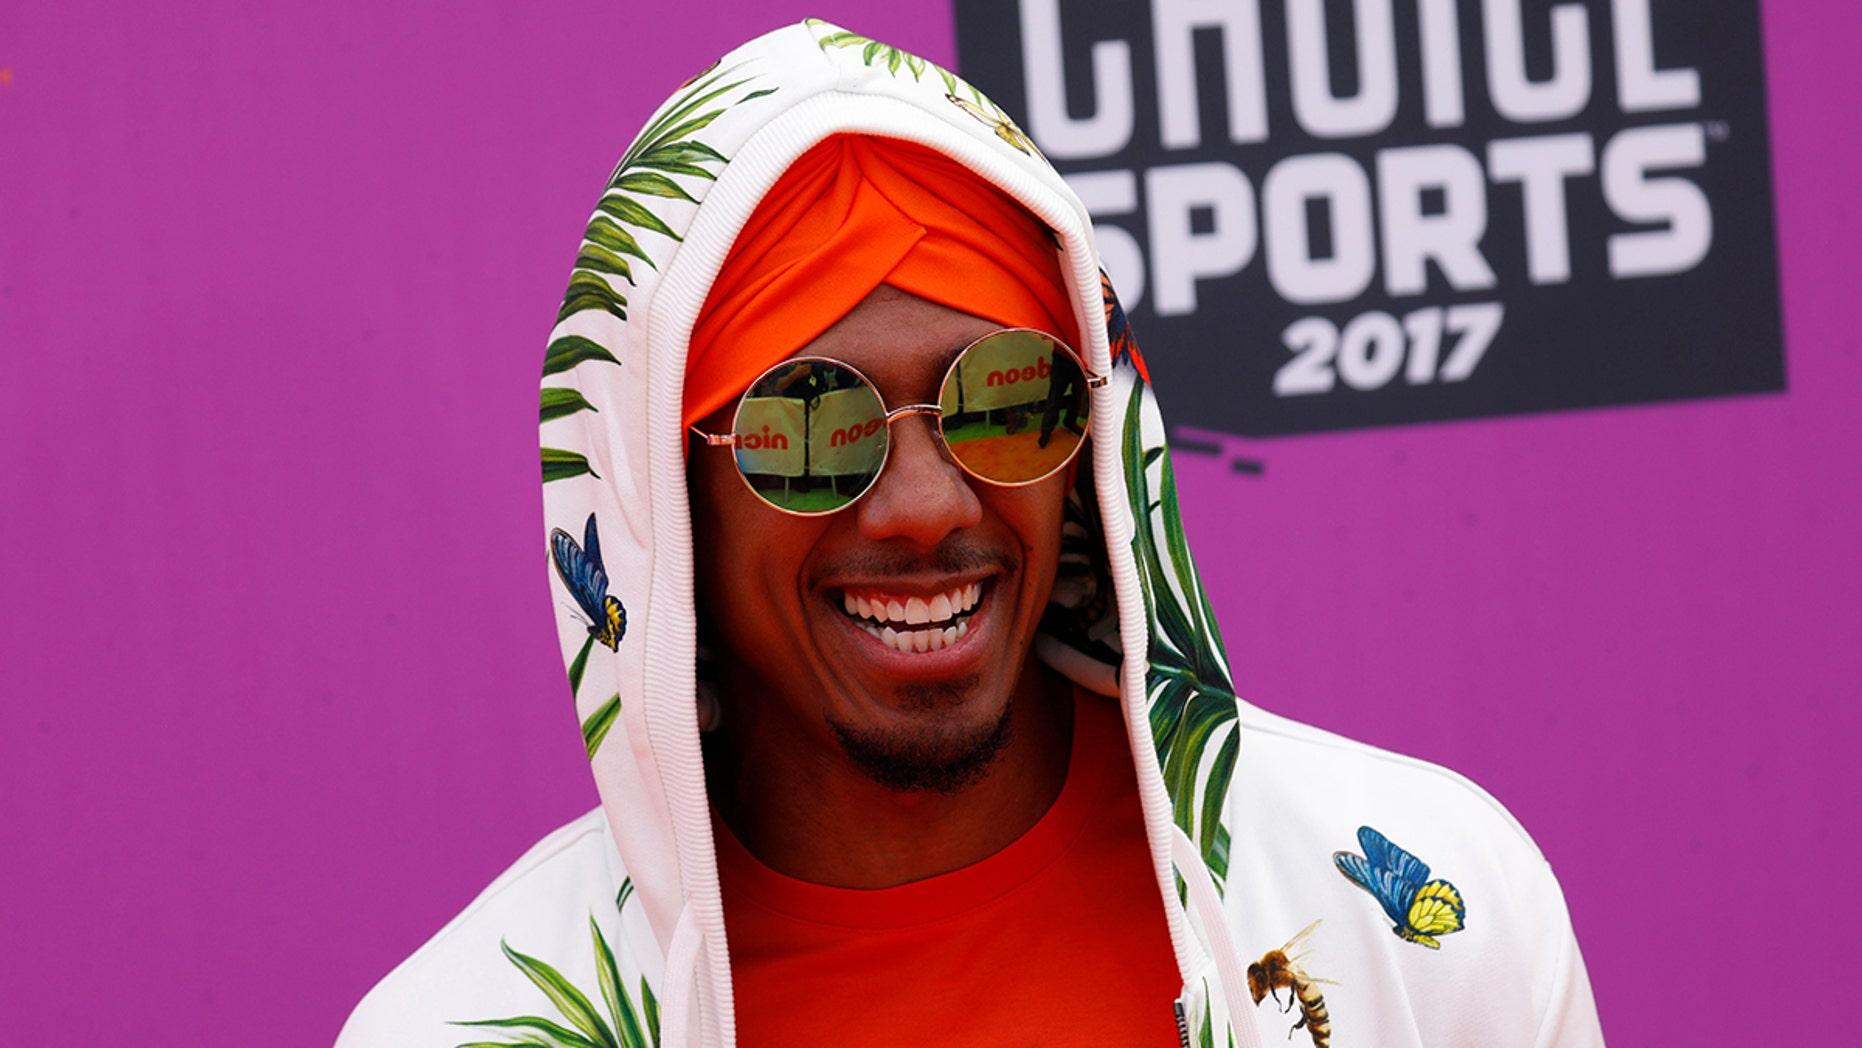 2017 Kids Choice Sport Awards – Arrivals – Los Angeles, California, U.S., 13/07/2017 - Entertainer Nick Cannon. REUTERS/Patrick T. Fallon - HP1ED7D1T944X